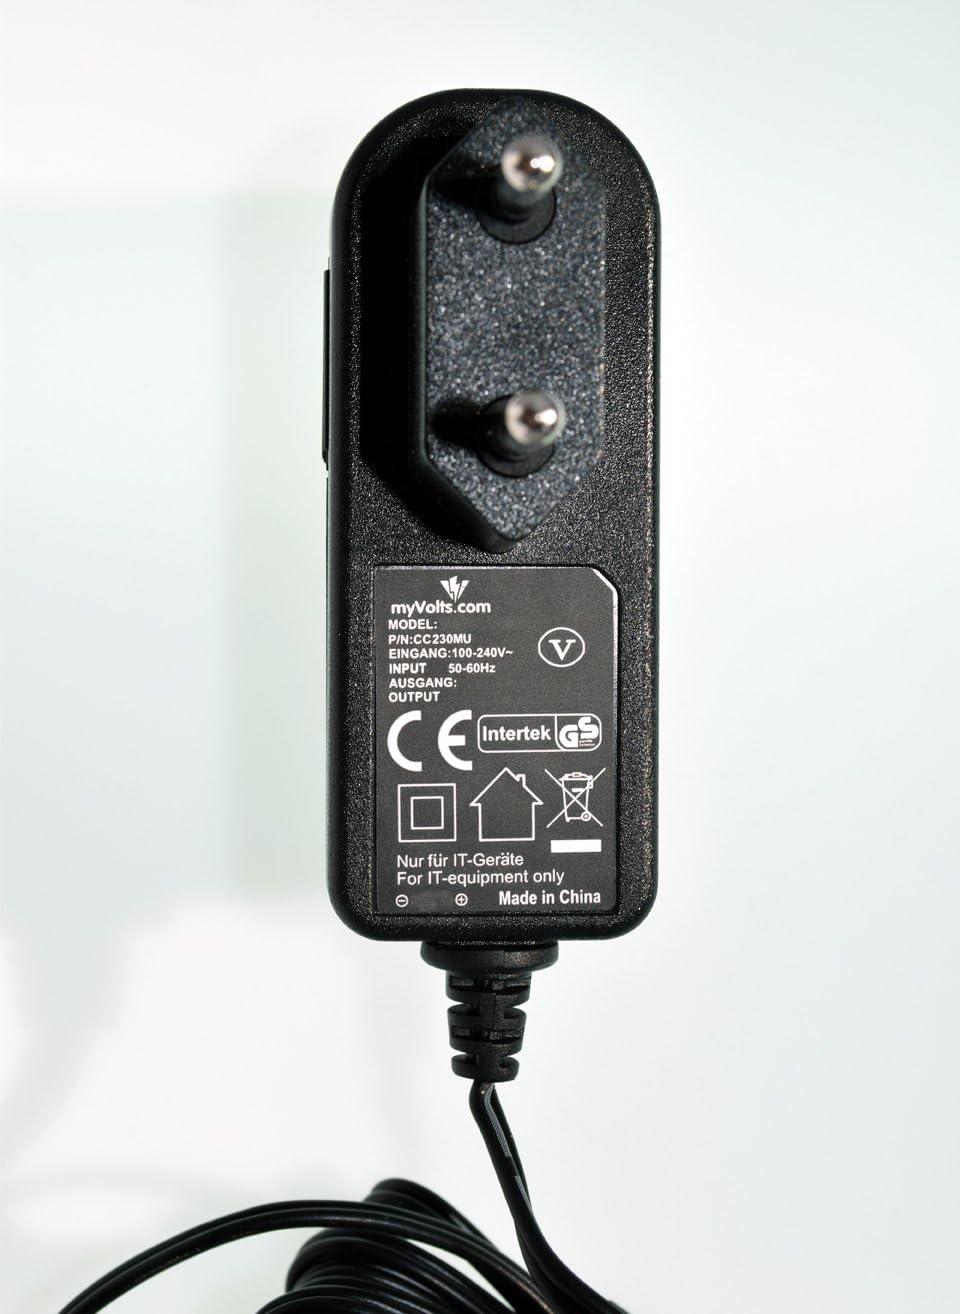 MyVolts 5V EU-Netzteil kompatibel mit Axis 206 IP-Kamera